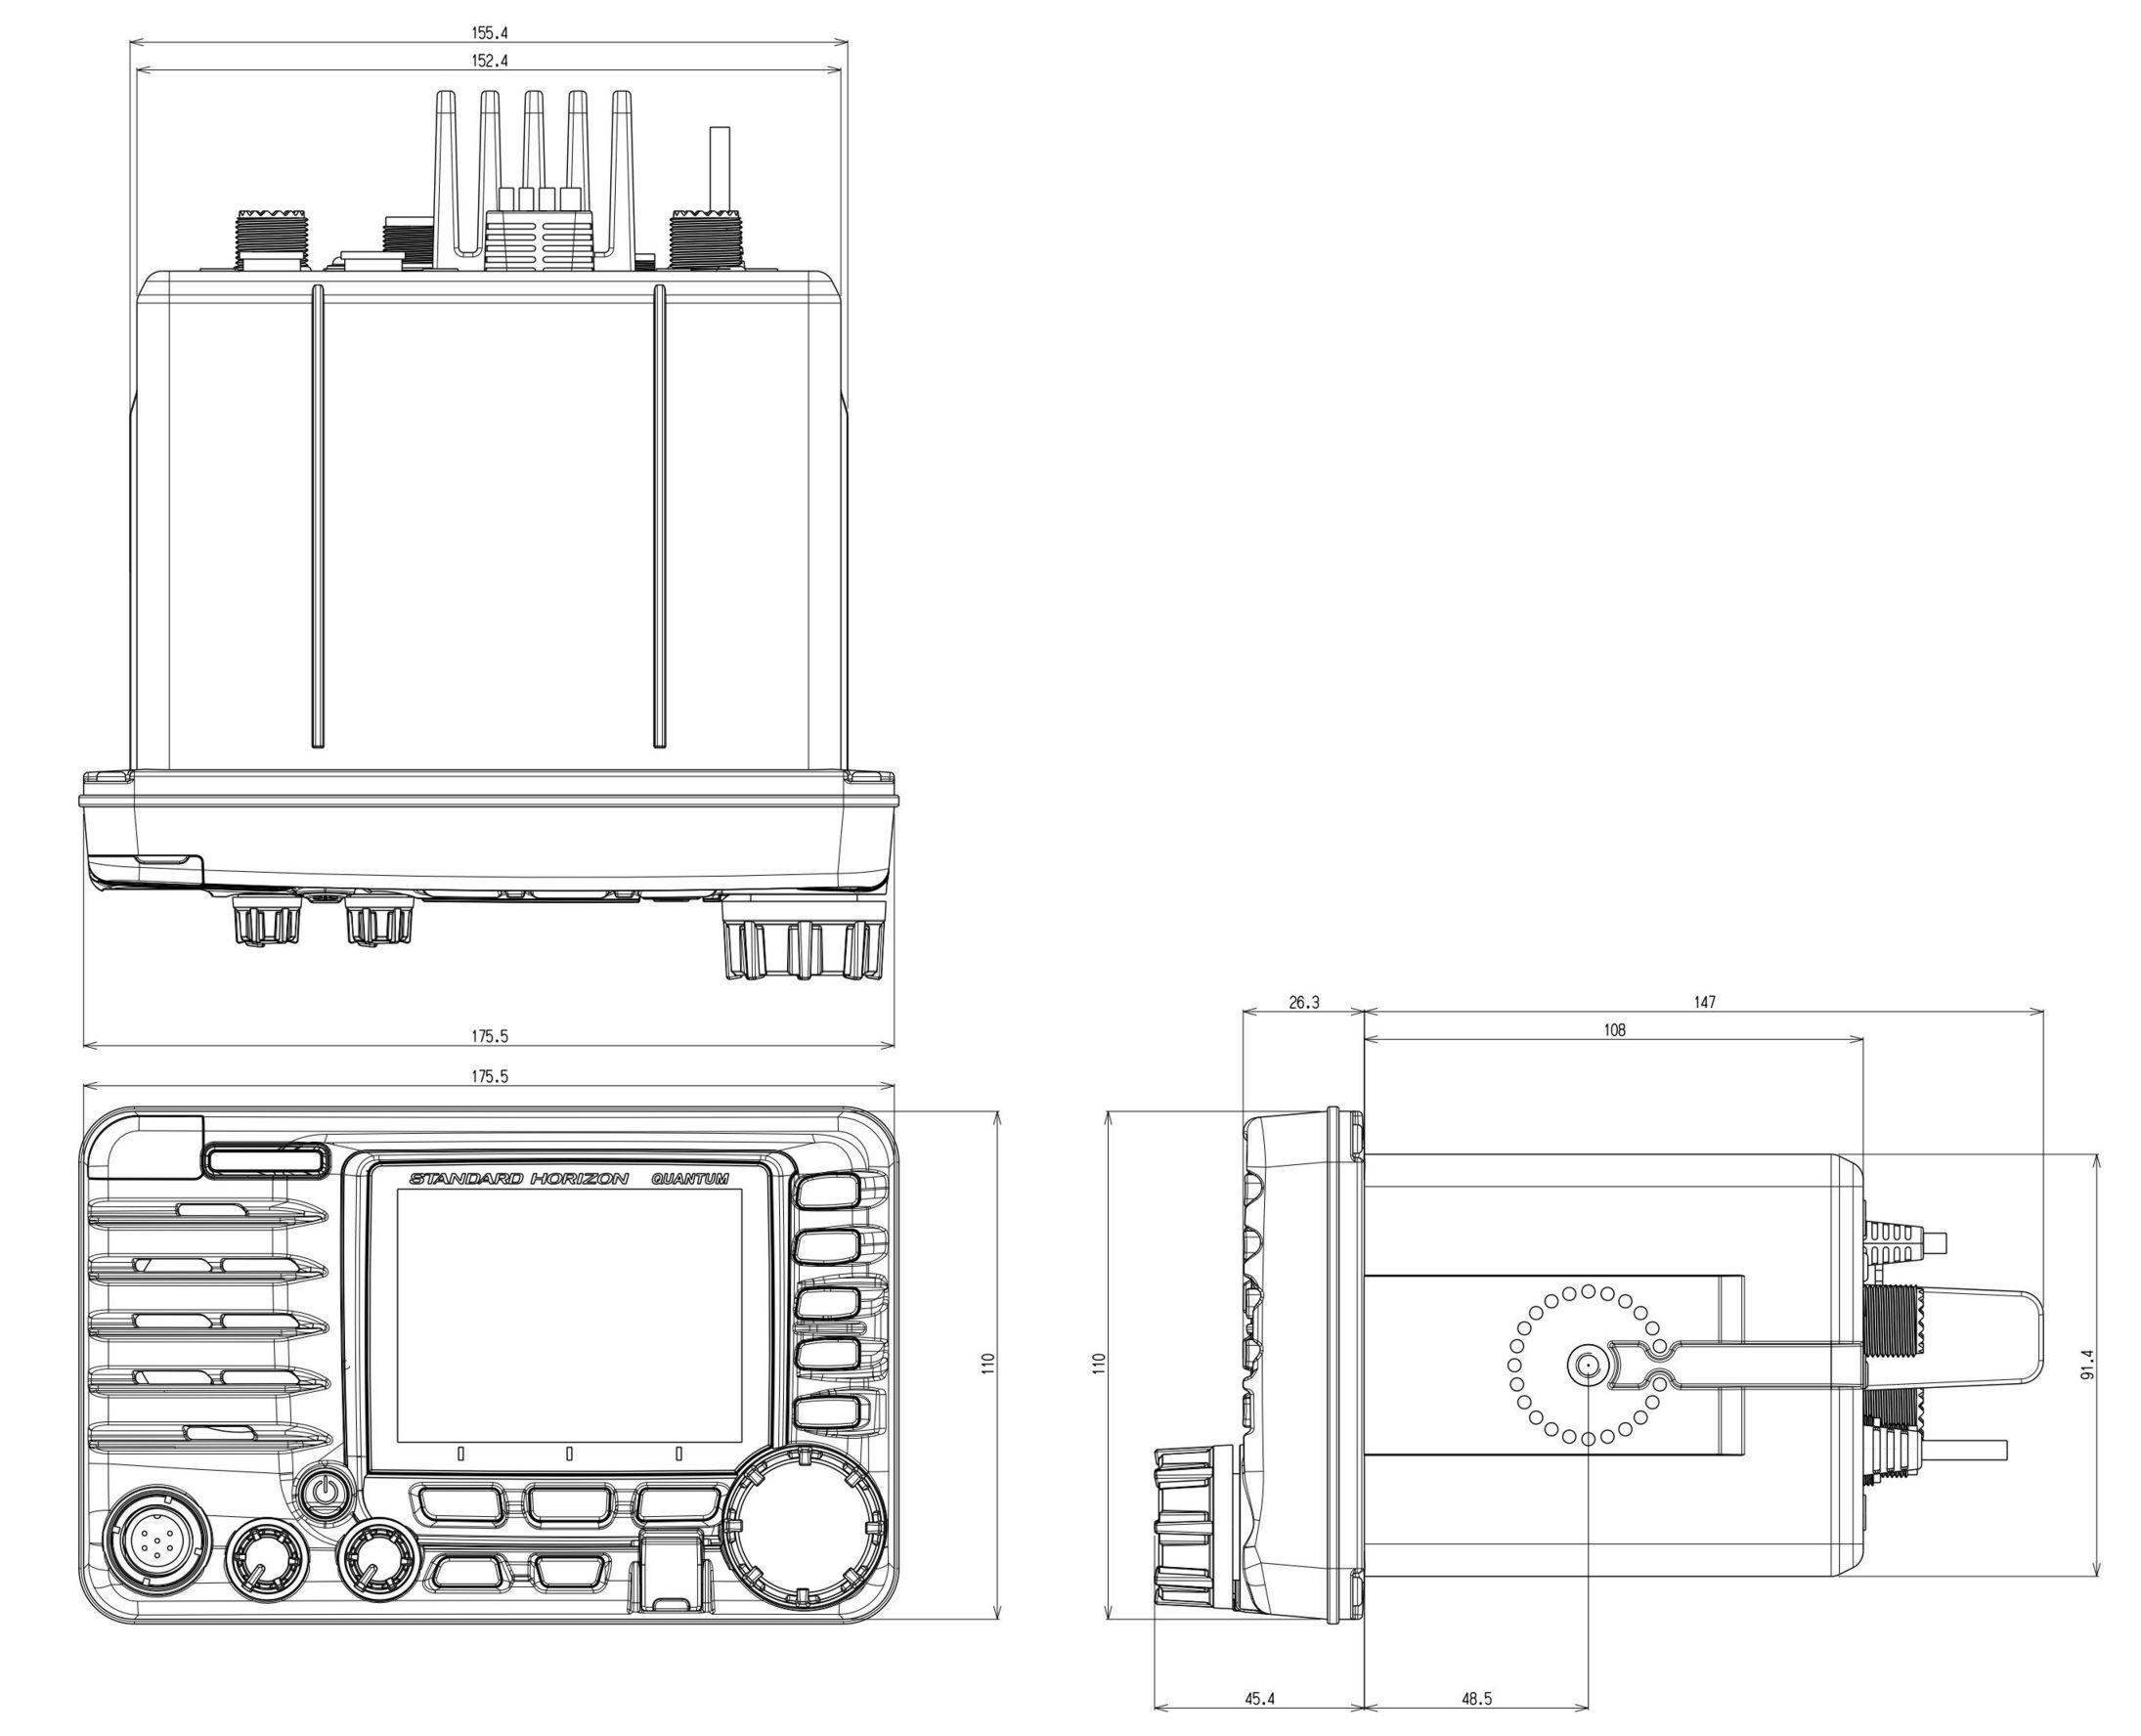 Panbo: The Marine Electronics Hub: Standard Horizon GX6500